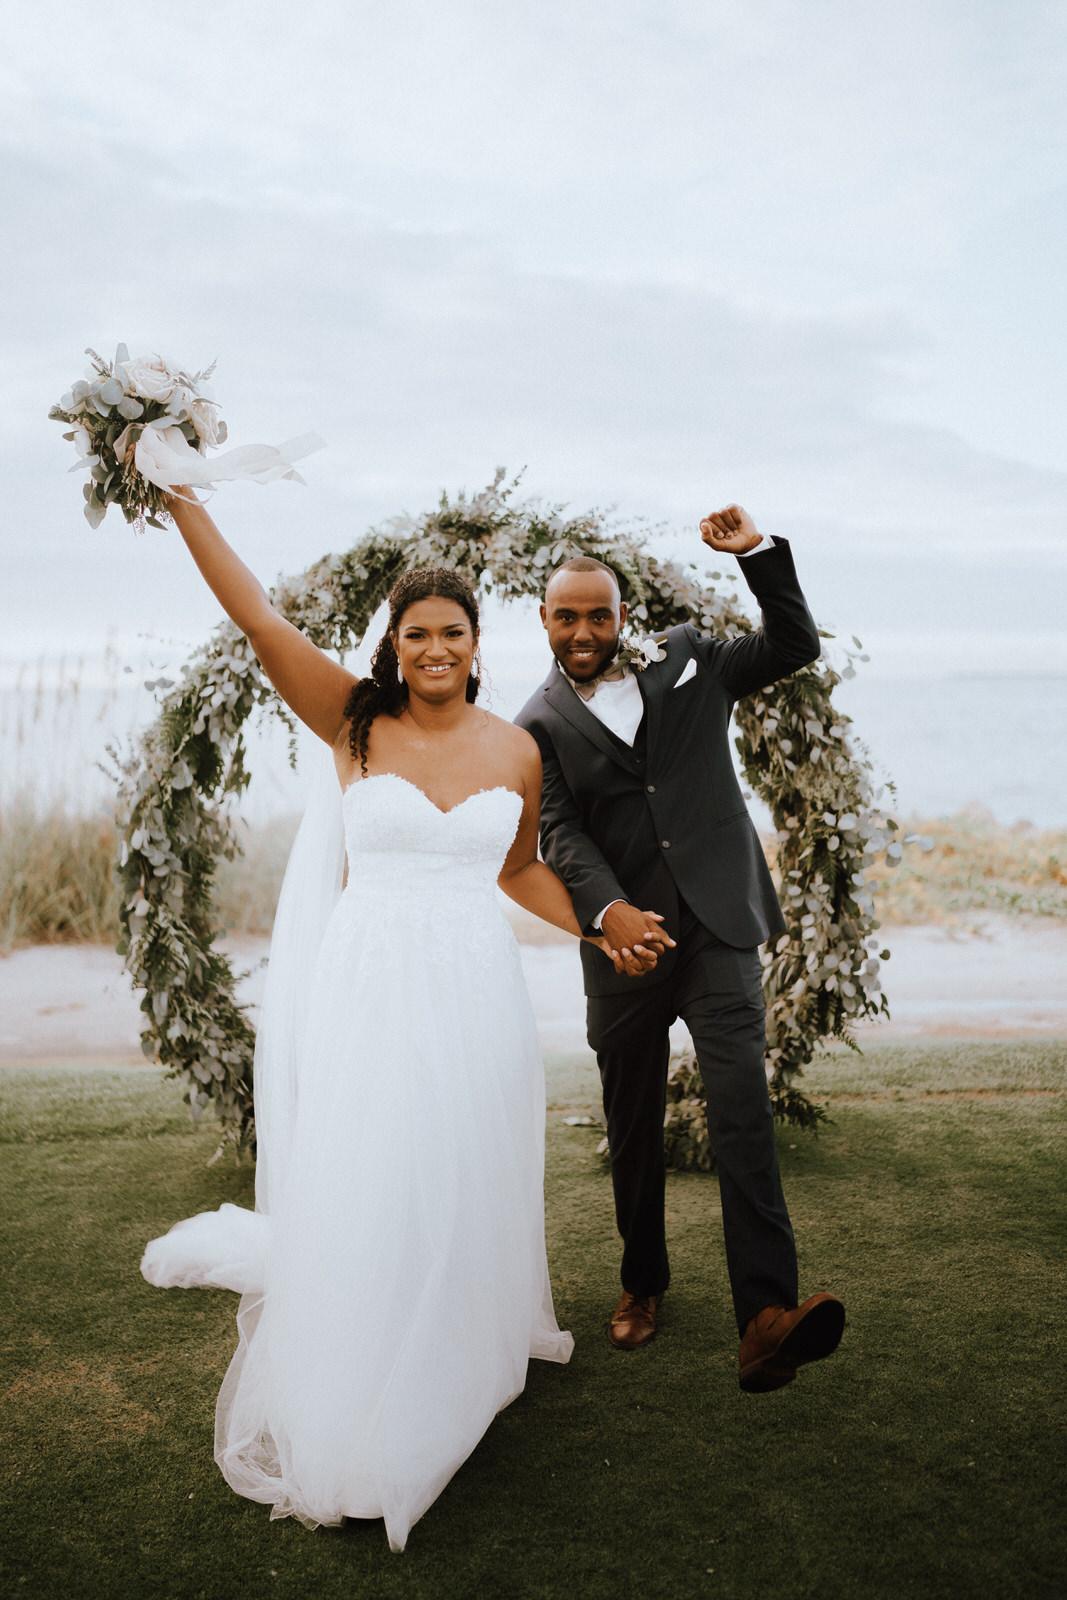 South Seas Island Resort Elopement- Alyana and Shawn- Michelle Gonzalez Photography-542.JPG